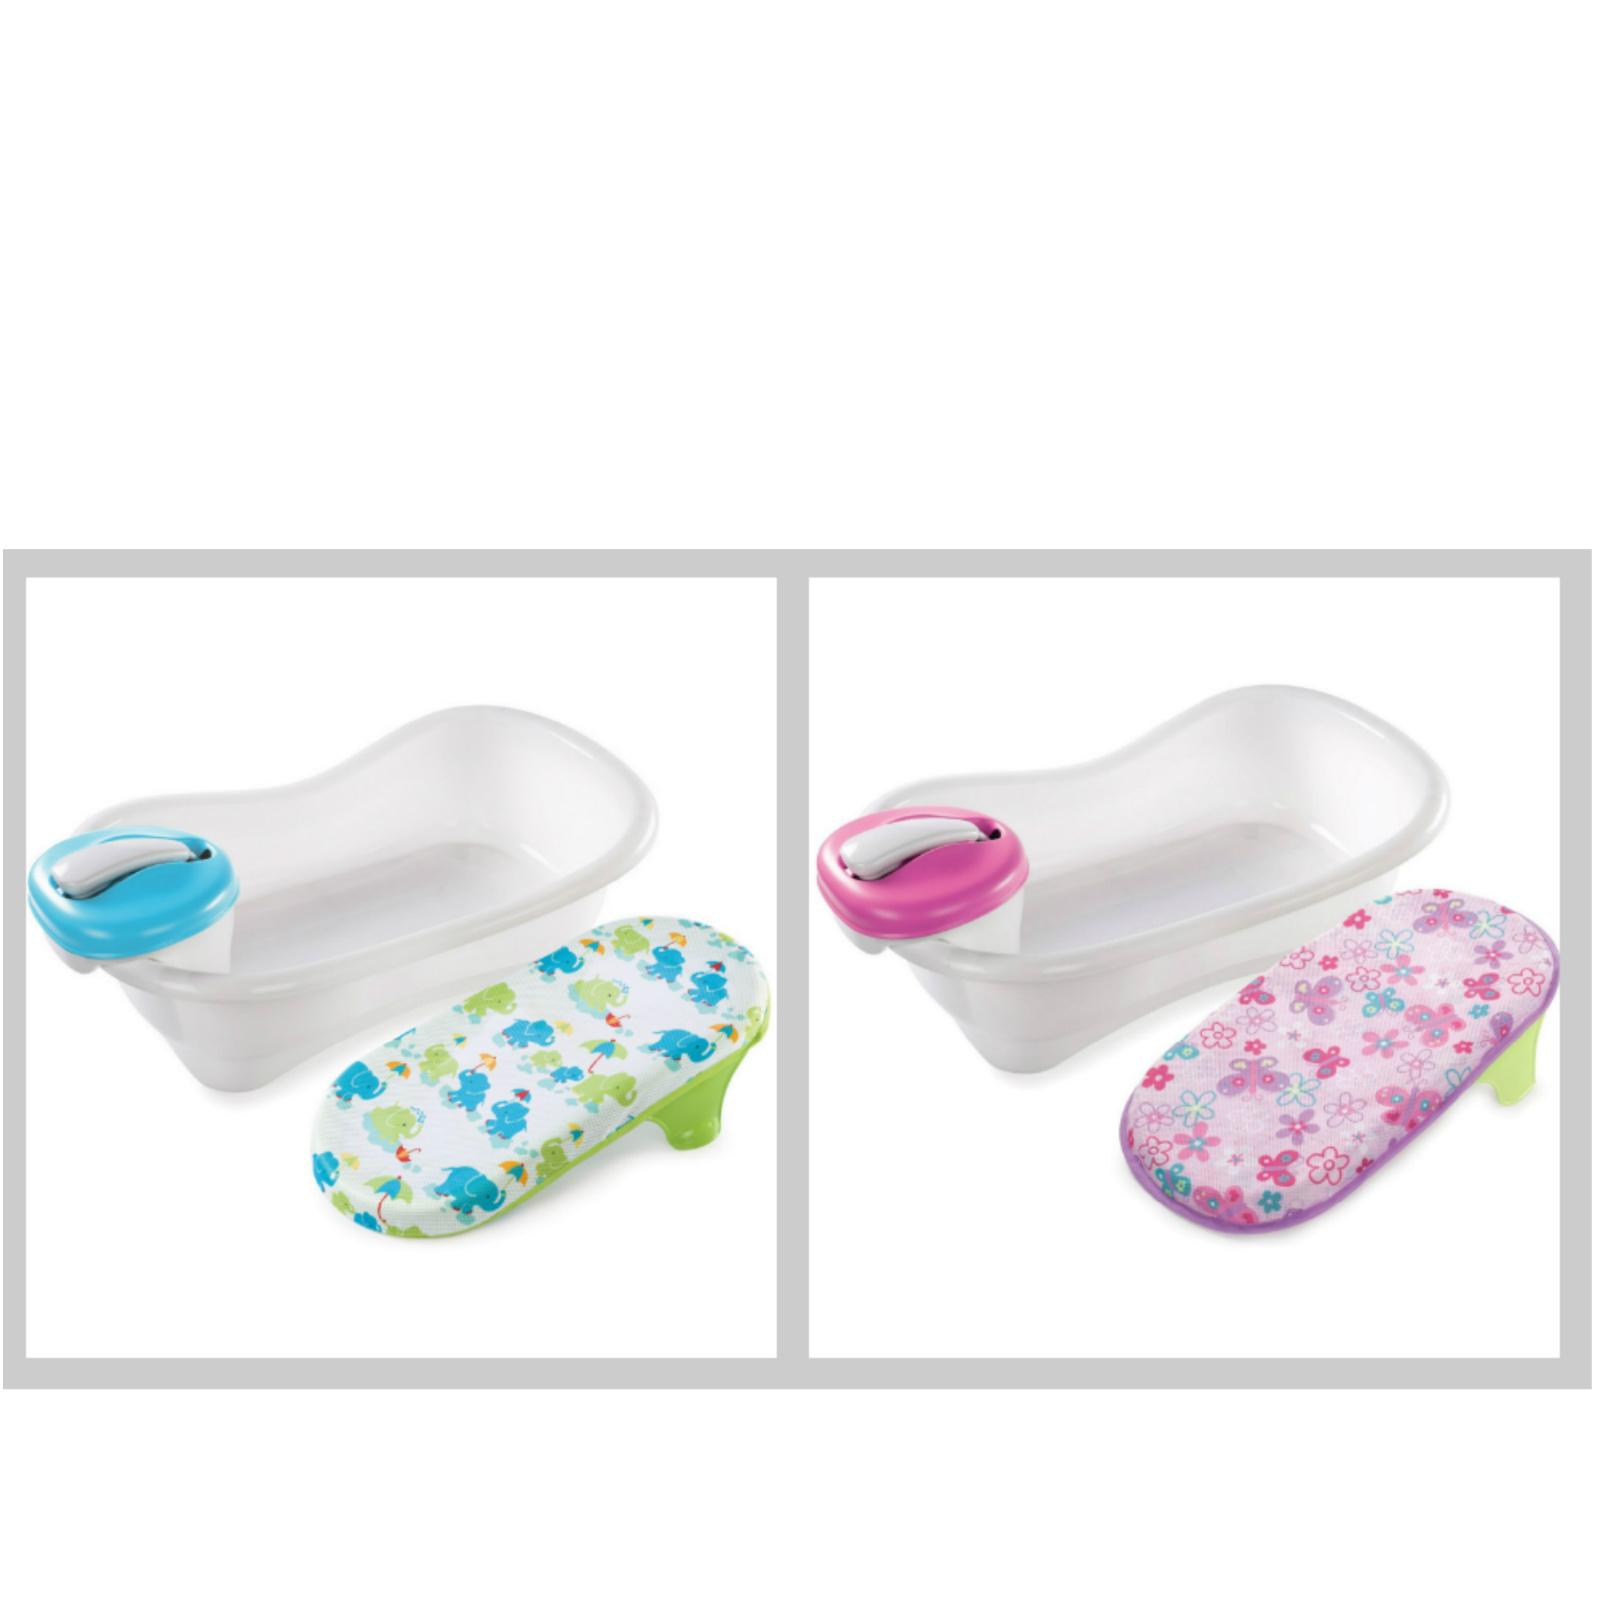 baby shower tub seat for newborns sling wash spa summer center toddlers sink new. Black Bedroom Furniture Sets. Home Design Ideas